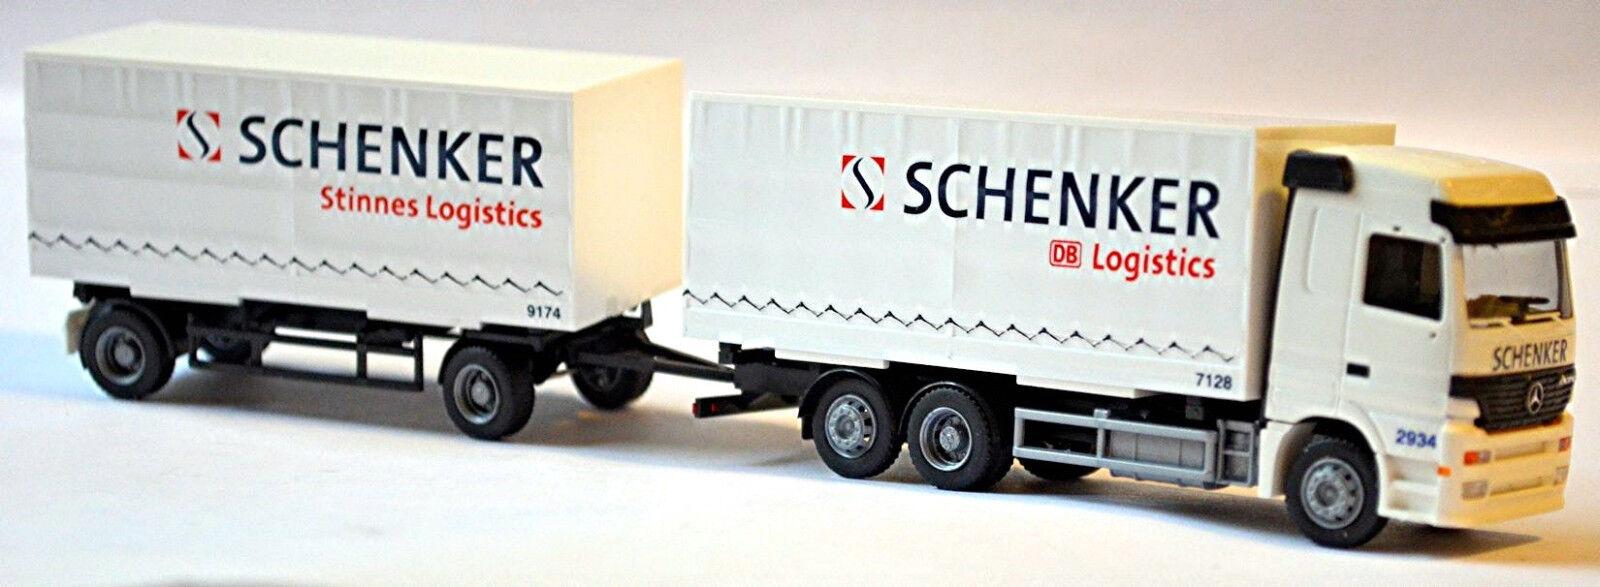 Mercedes-benz Actros LH Roadtrain Schenker Db Logistics 1 87 Rietze